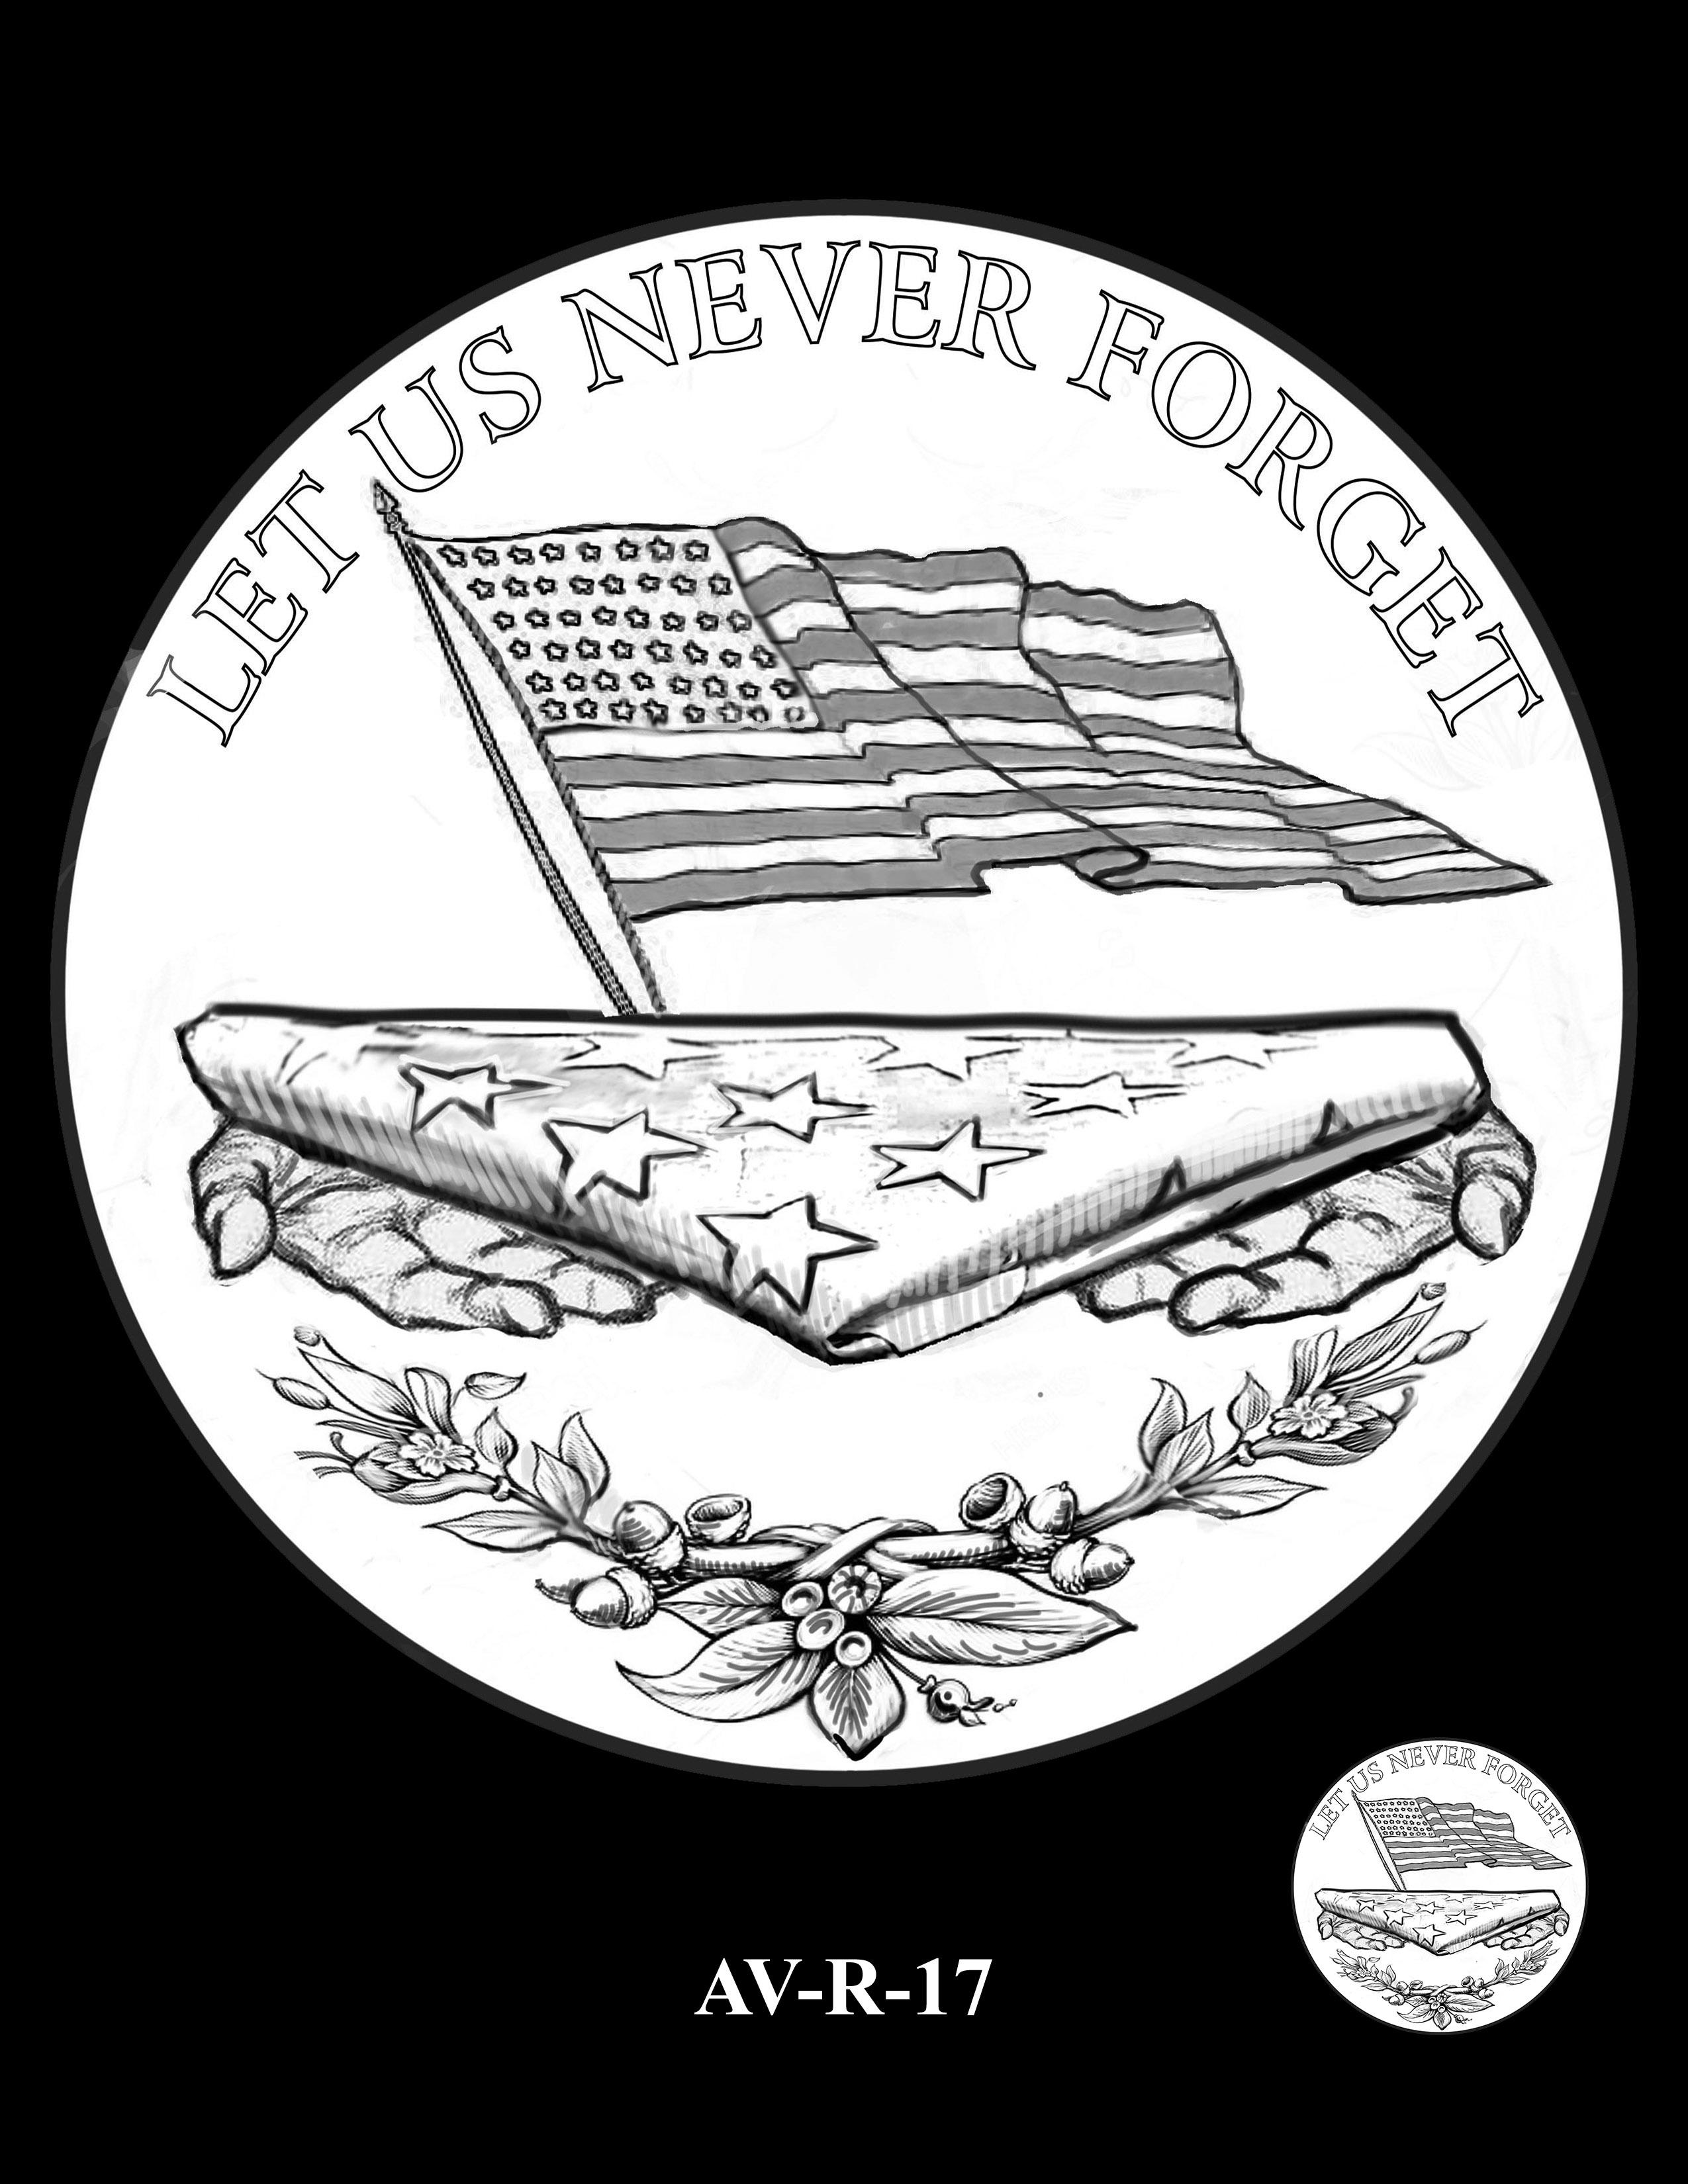 AV-R-17 - American Veterans Medal